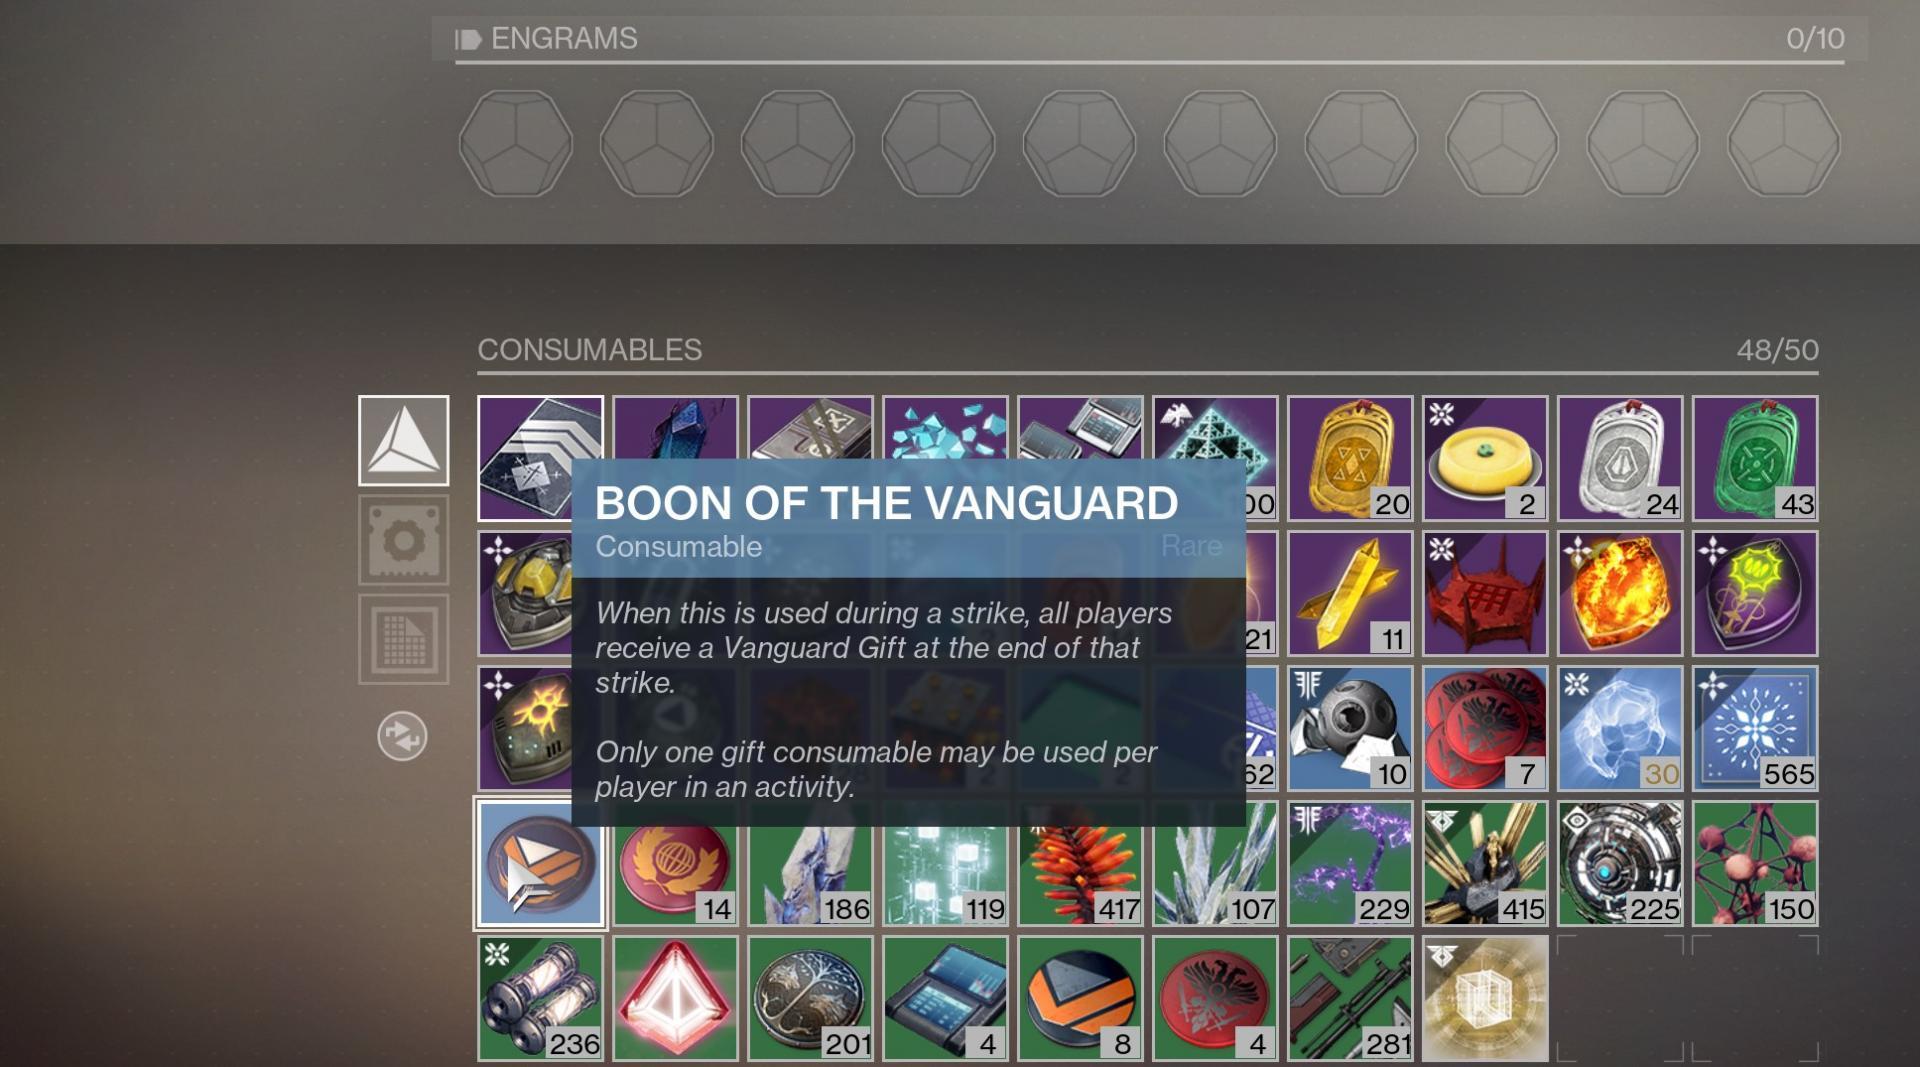 Boon of the Vanguard